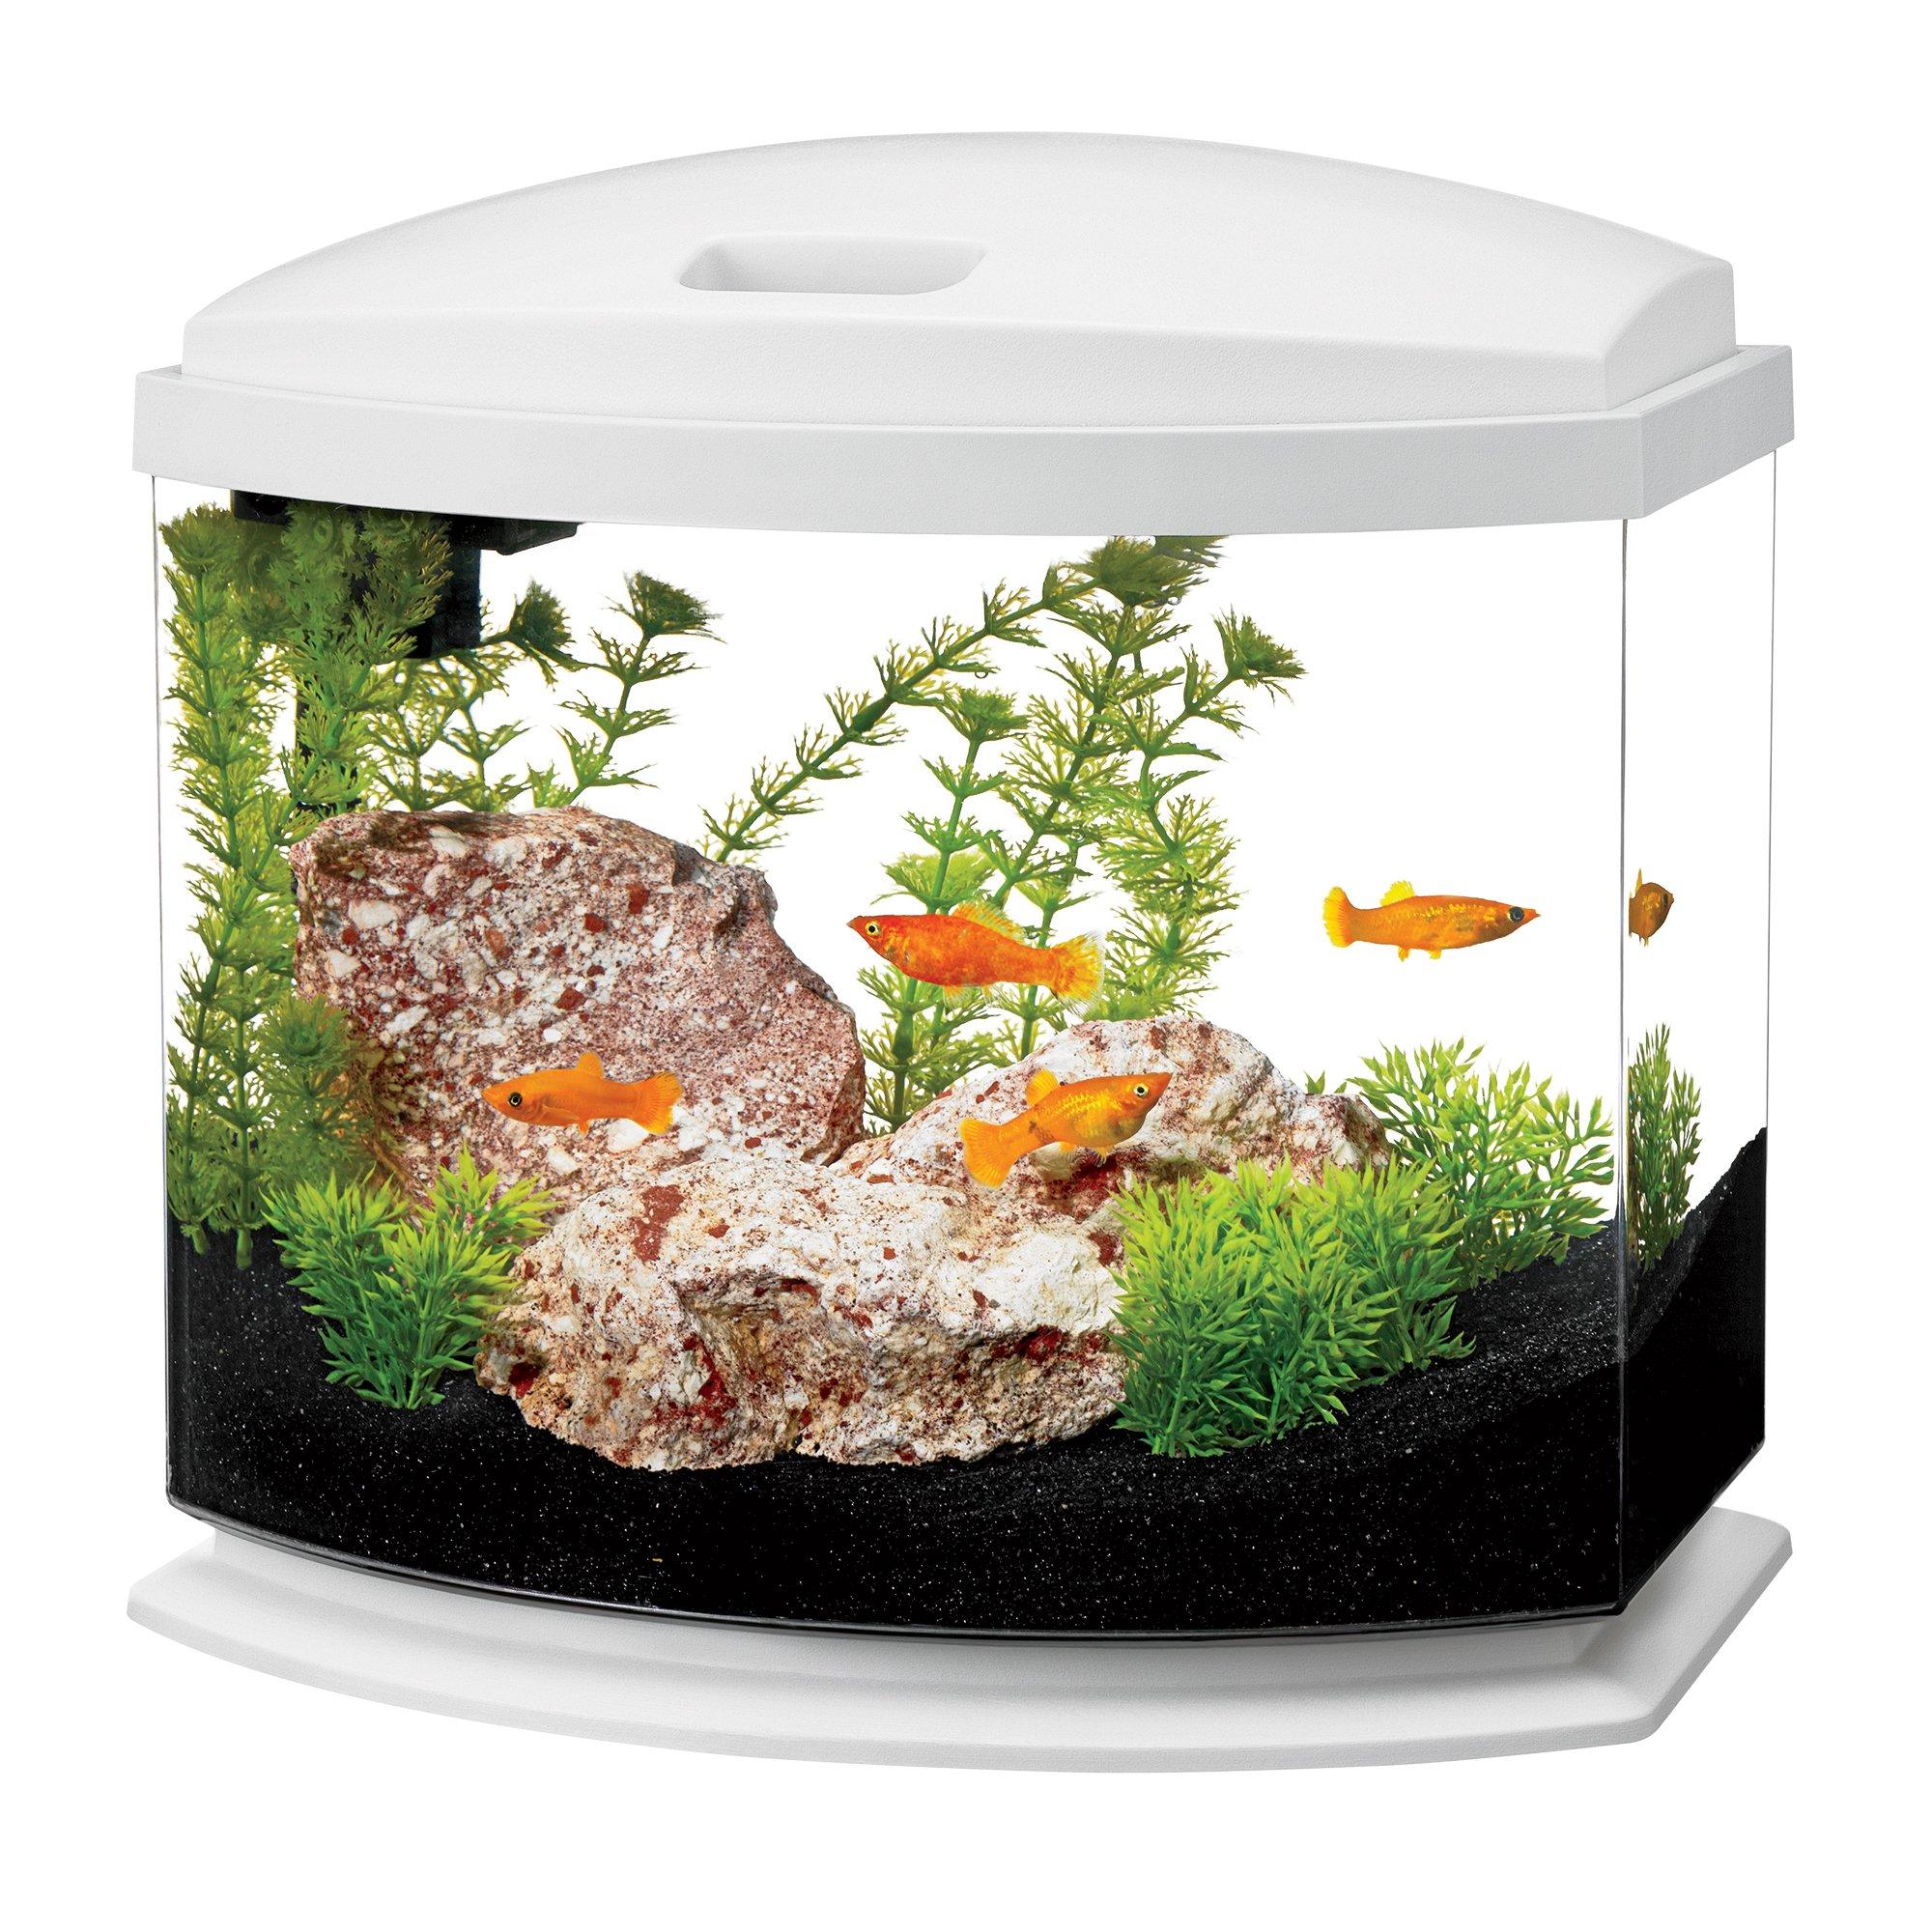 Aqueon LED Minibow Aquarium Starter Kits with LED Lighting, 5 Gallon, White by Aqueon